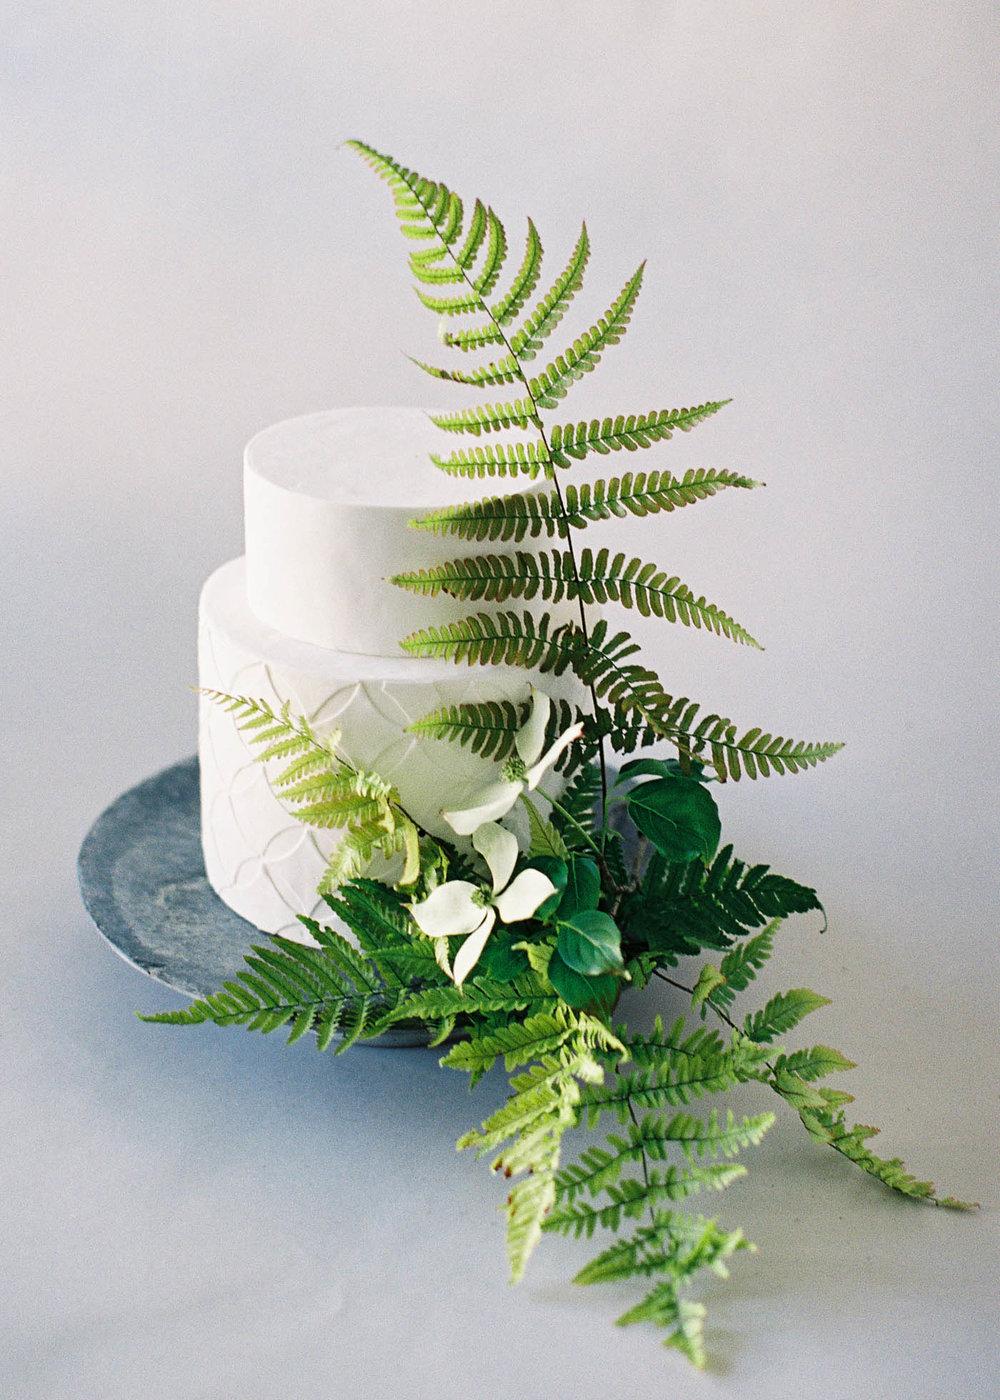 naturalist-cakes-8-Jen_Huang-000486-R1-025-11.jpg